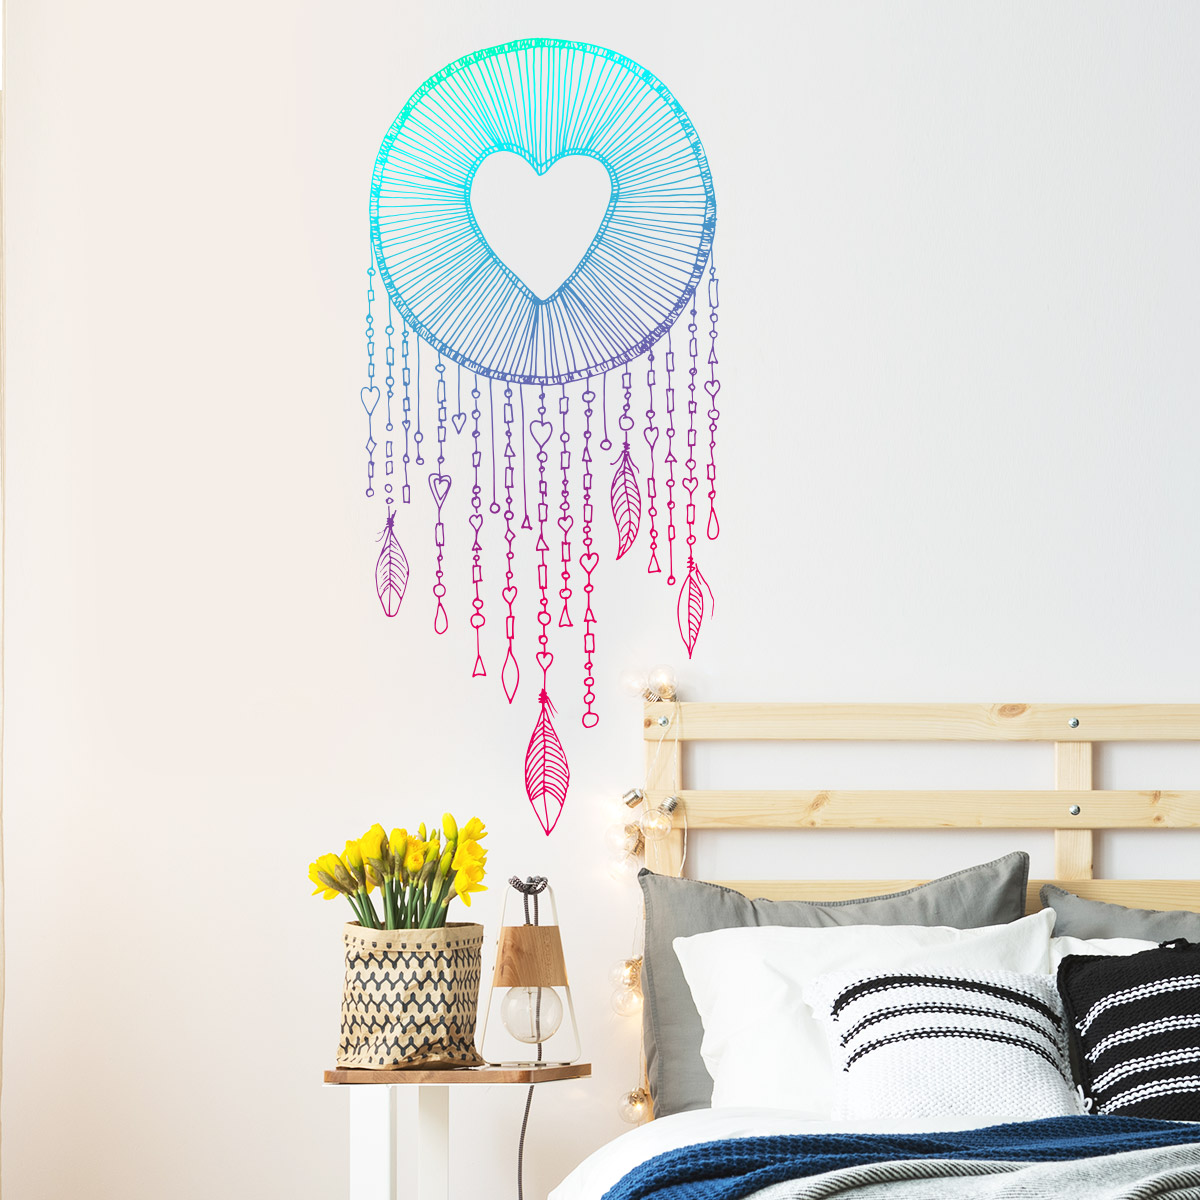 sticker boh me attrape r ves c ur stickers chambre t tes. Black Bedroom Furniture Sets. Home Design Ideas